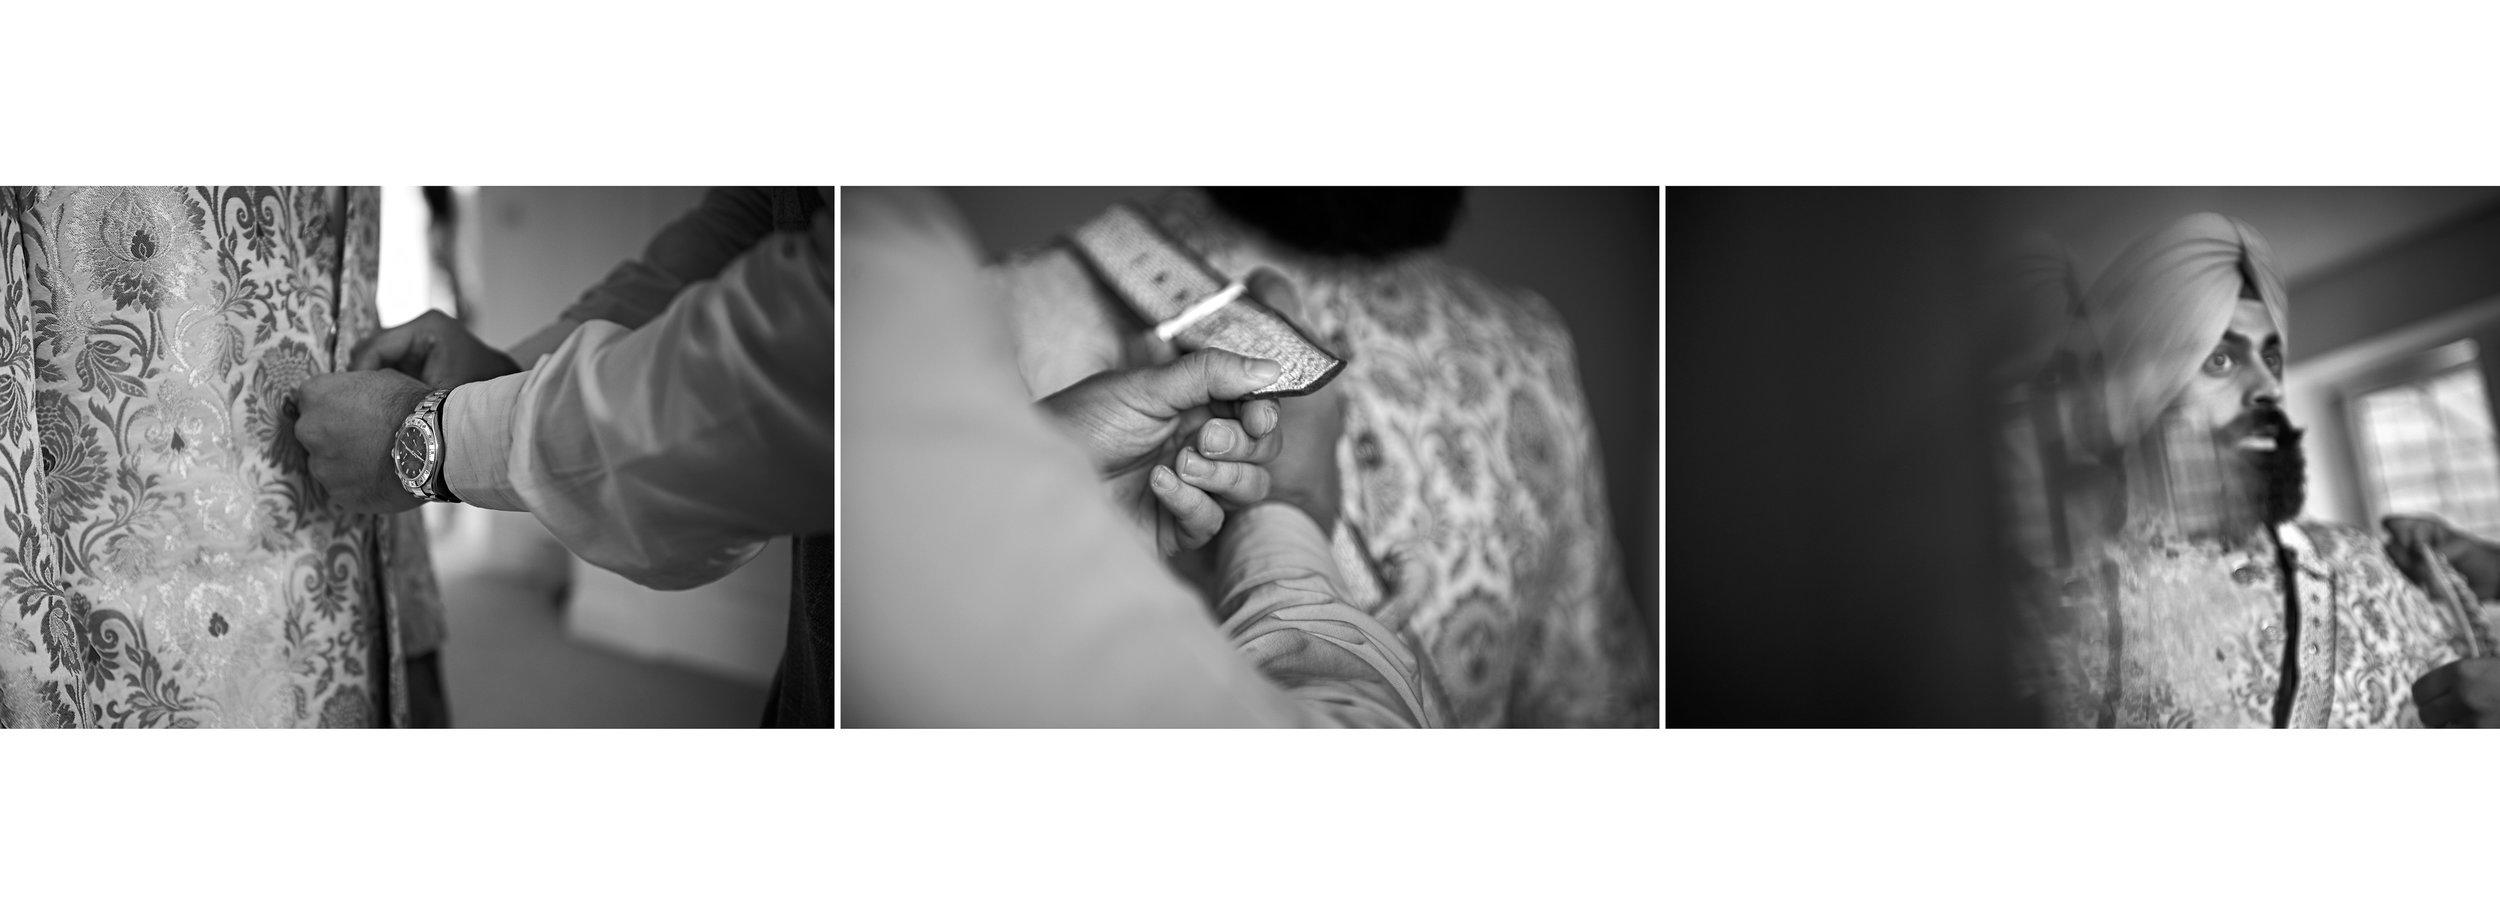 Sikh Wedding - Jaspreet and Indy-17.jpg